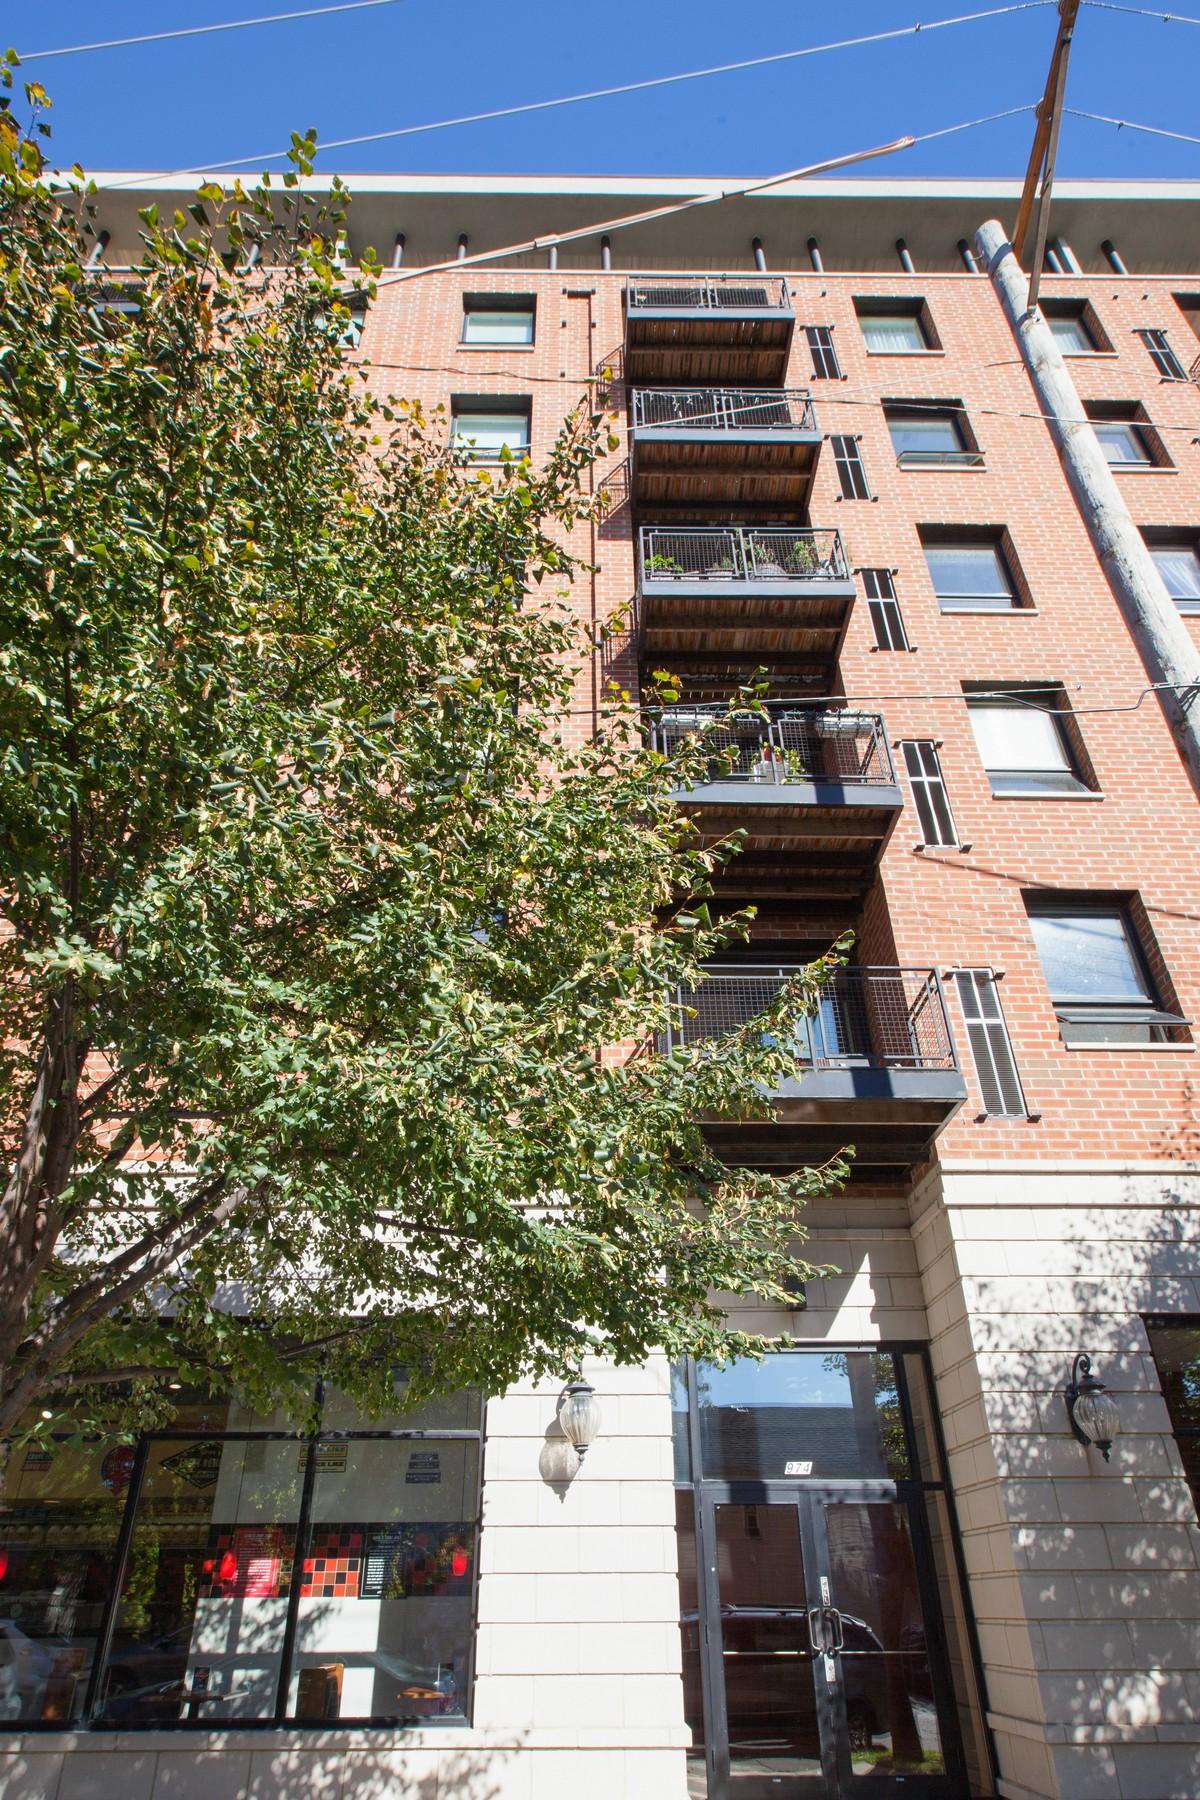 974 W 35th Pl, Chicago, IL 60609